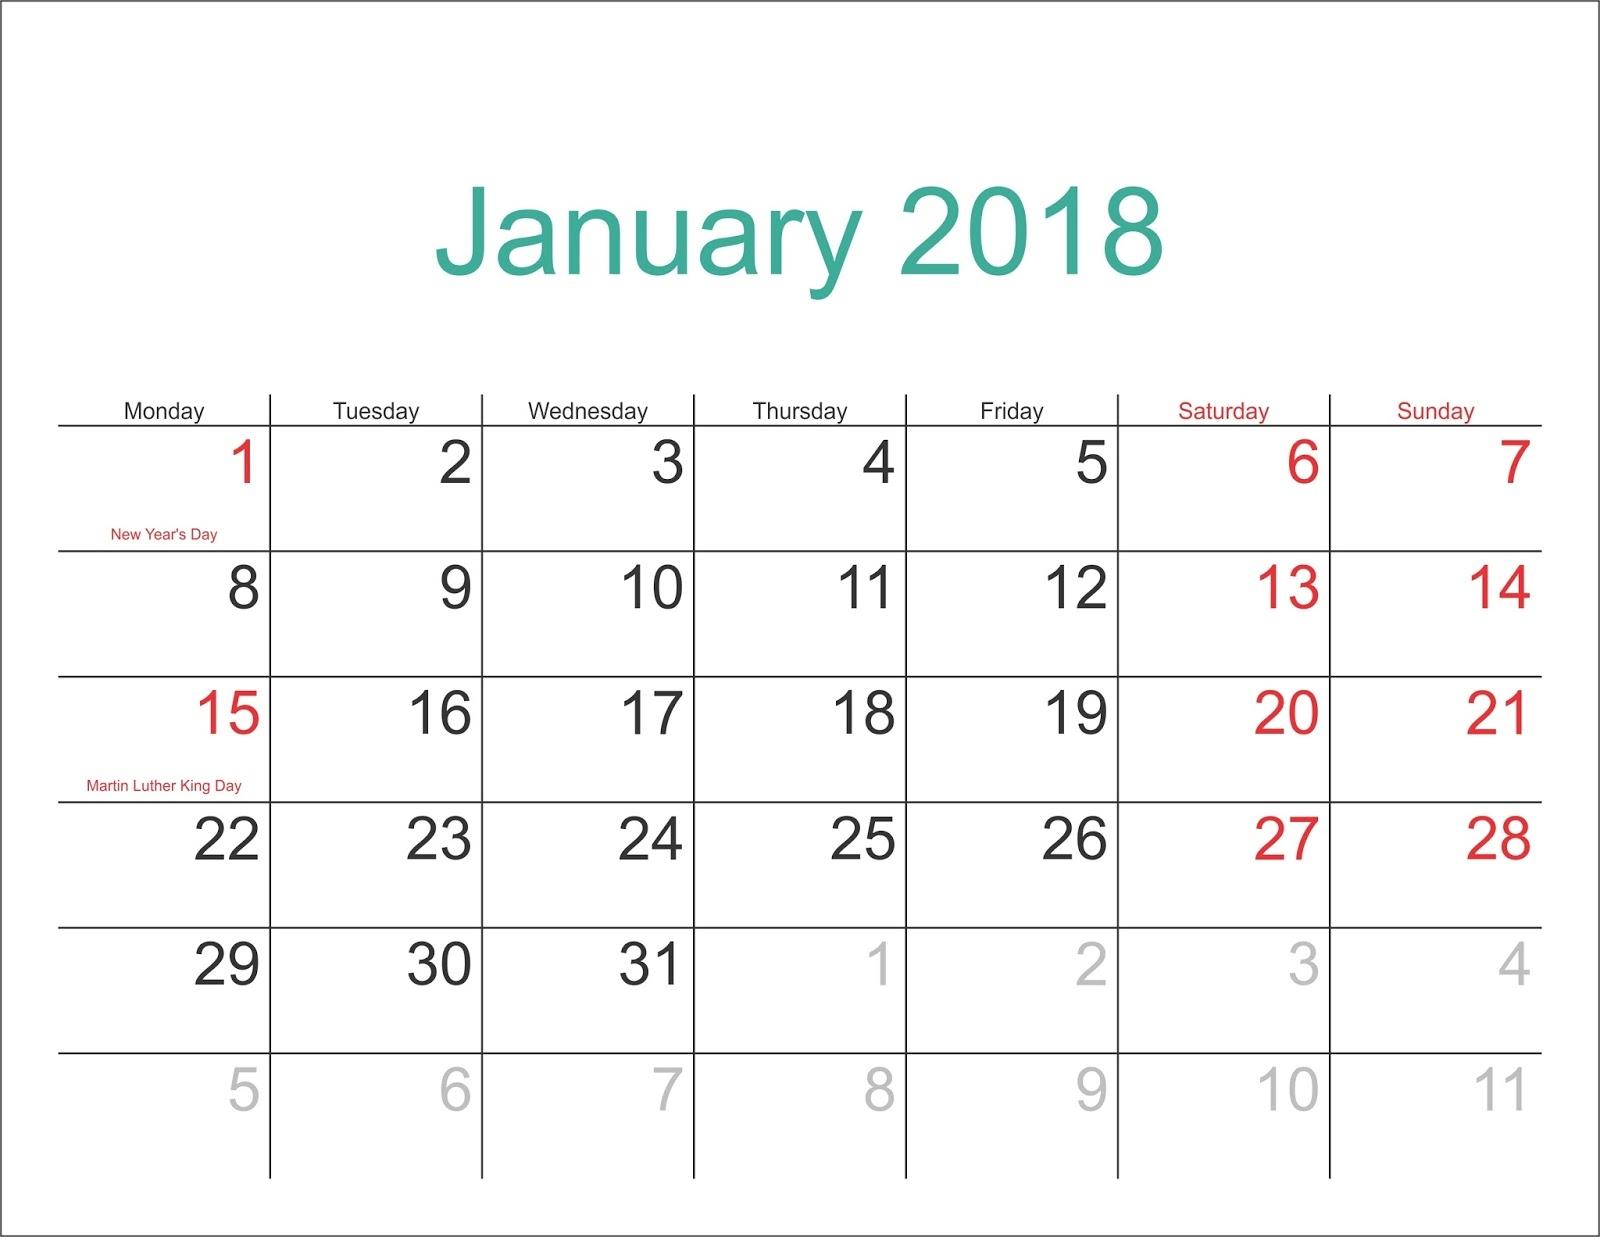 January 2018 Printable Calendar Templates 89uj